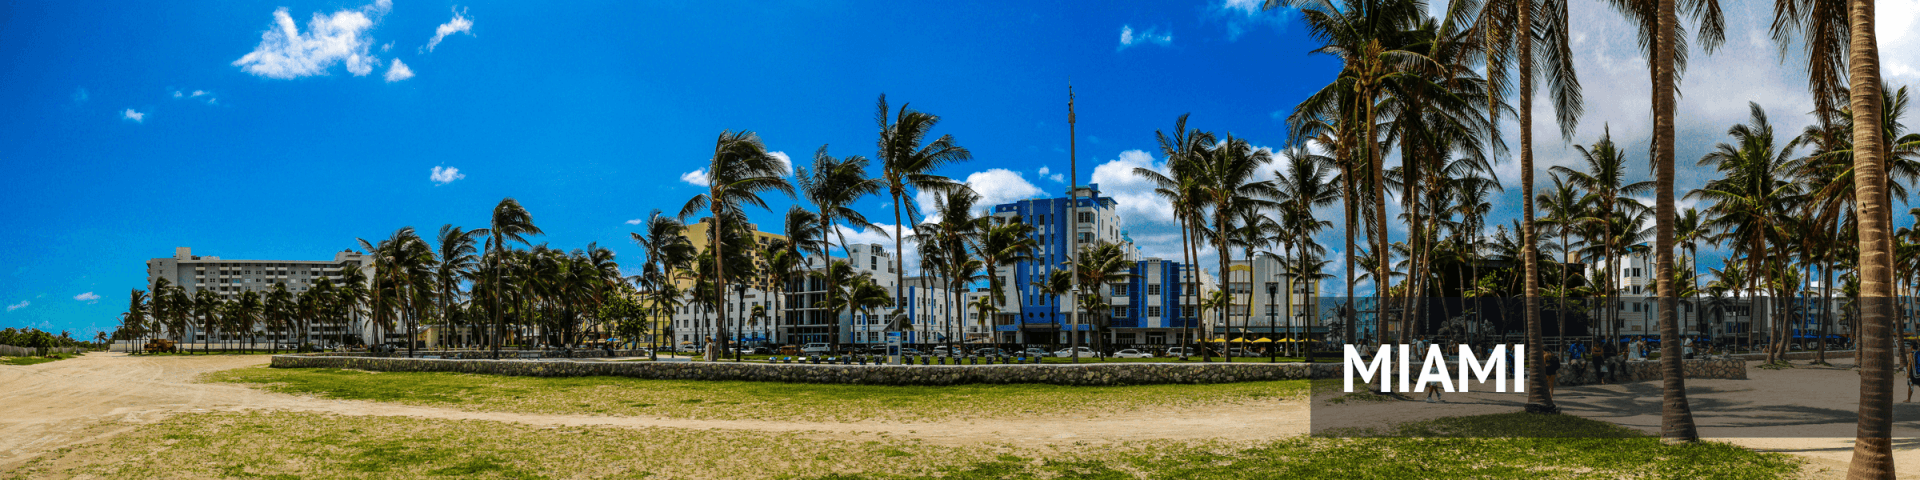 Miami Header